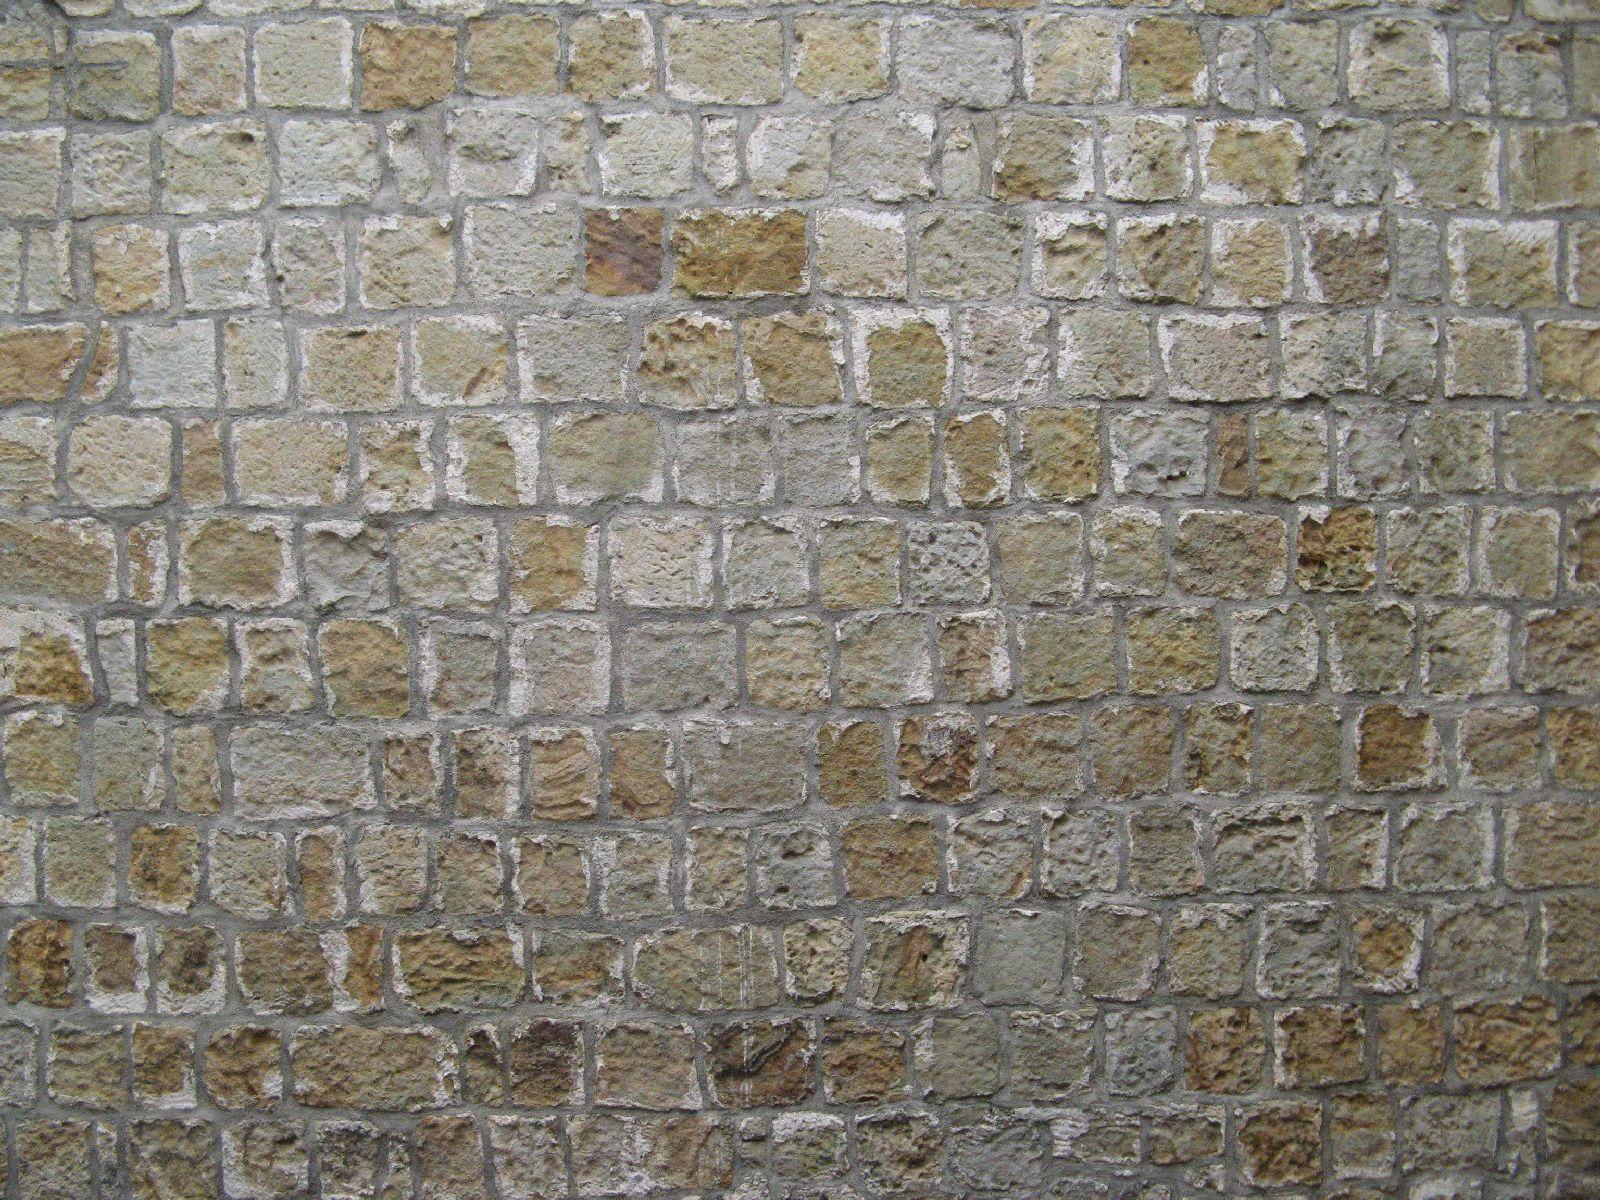 Stone Block Wall Texture : Free stone block wall texture photo gallery